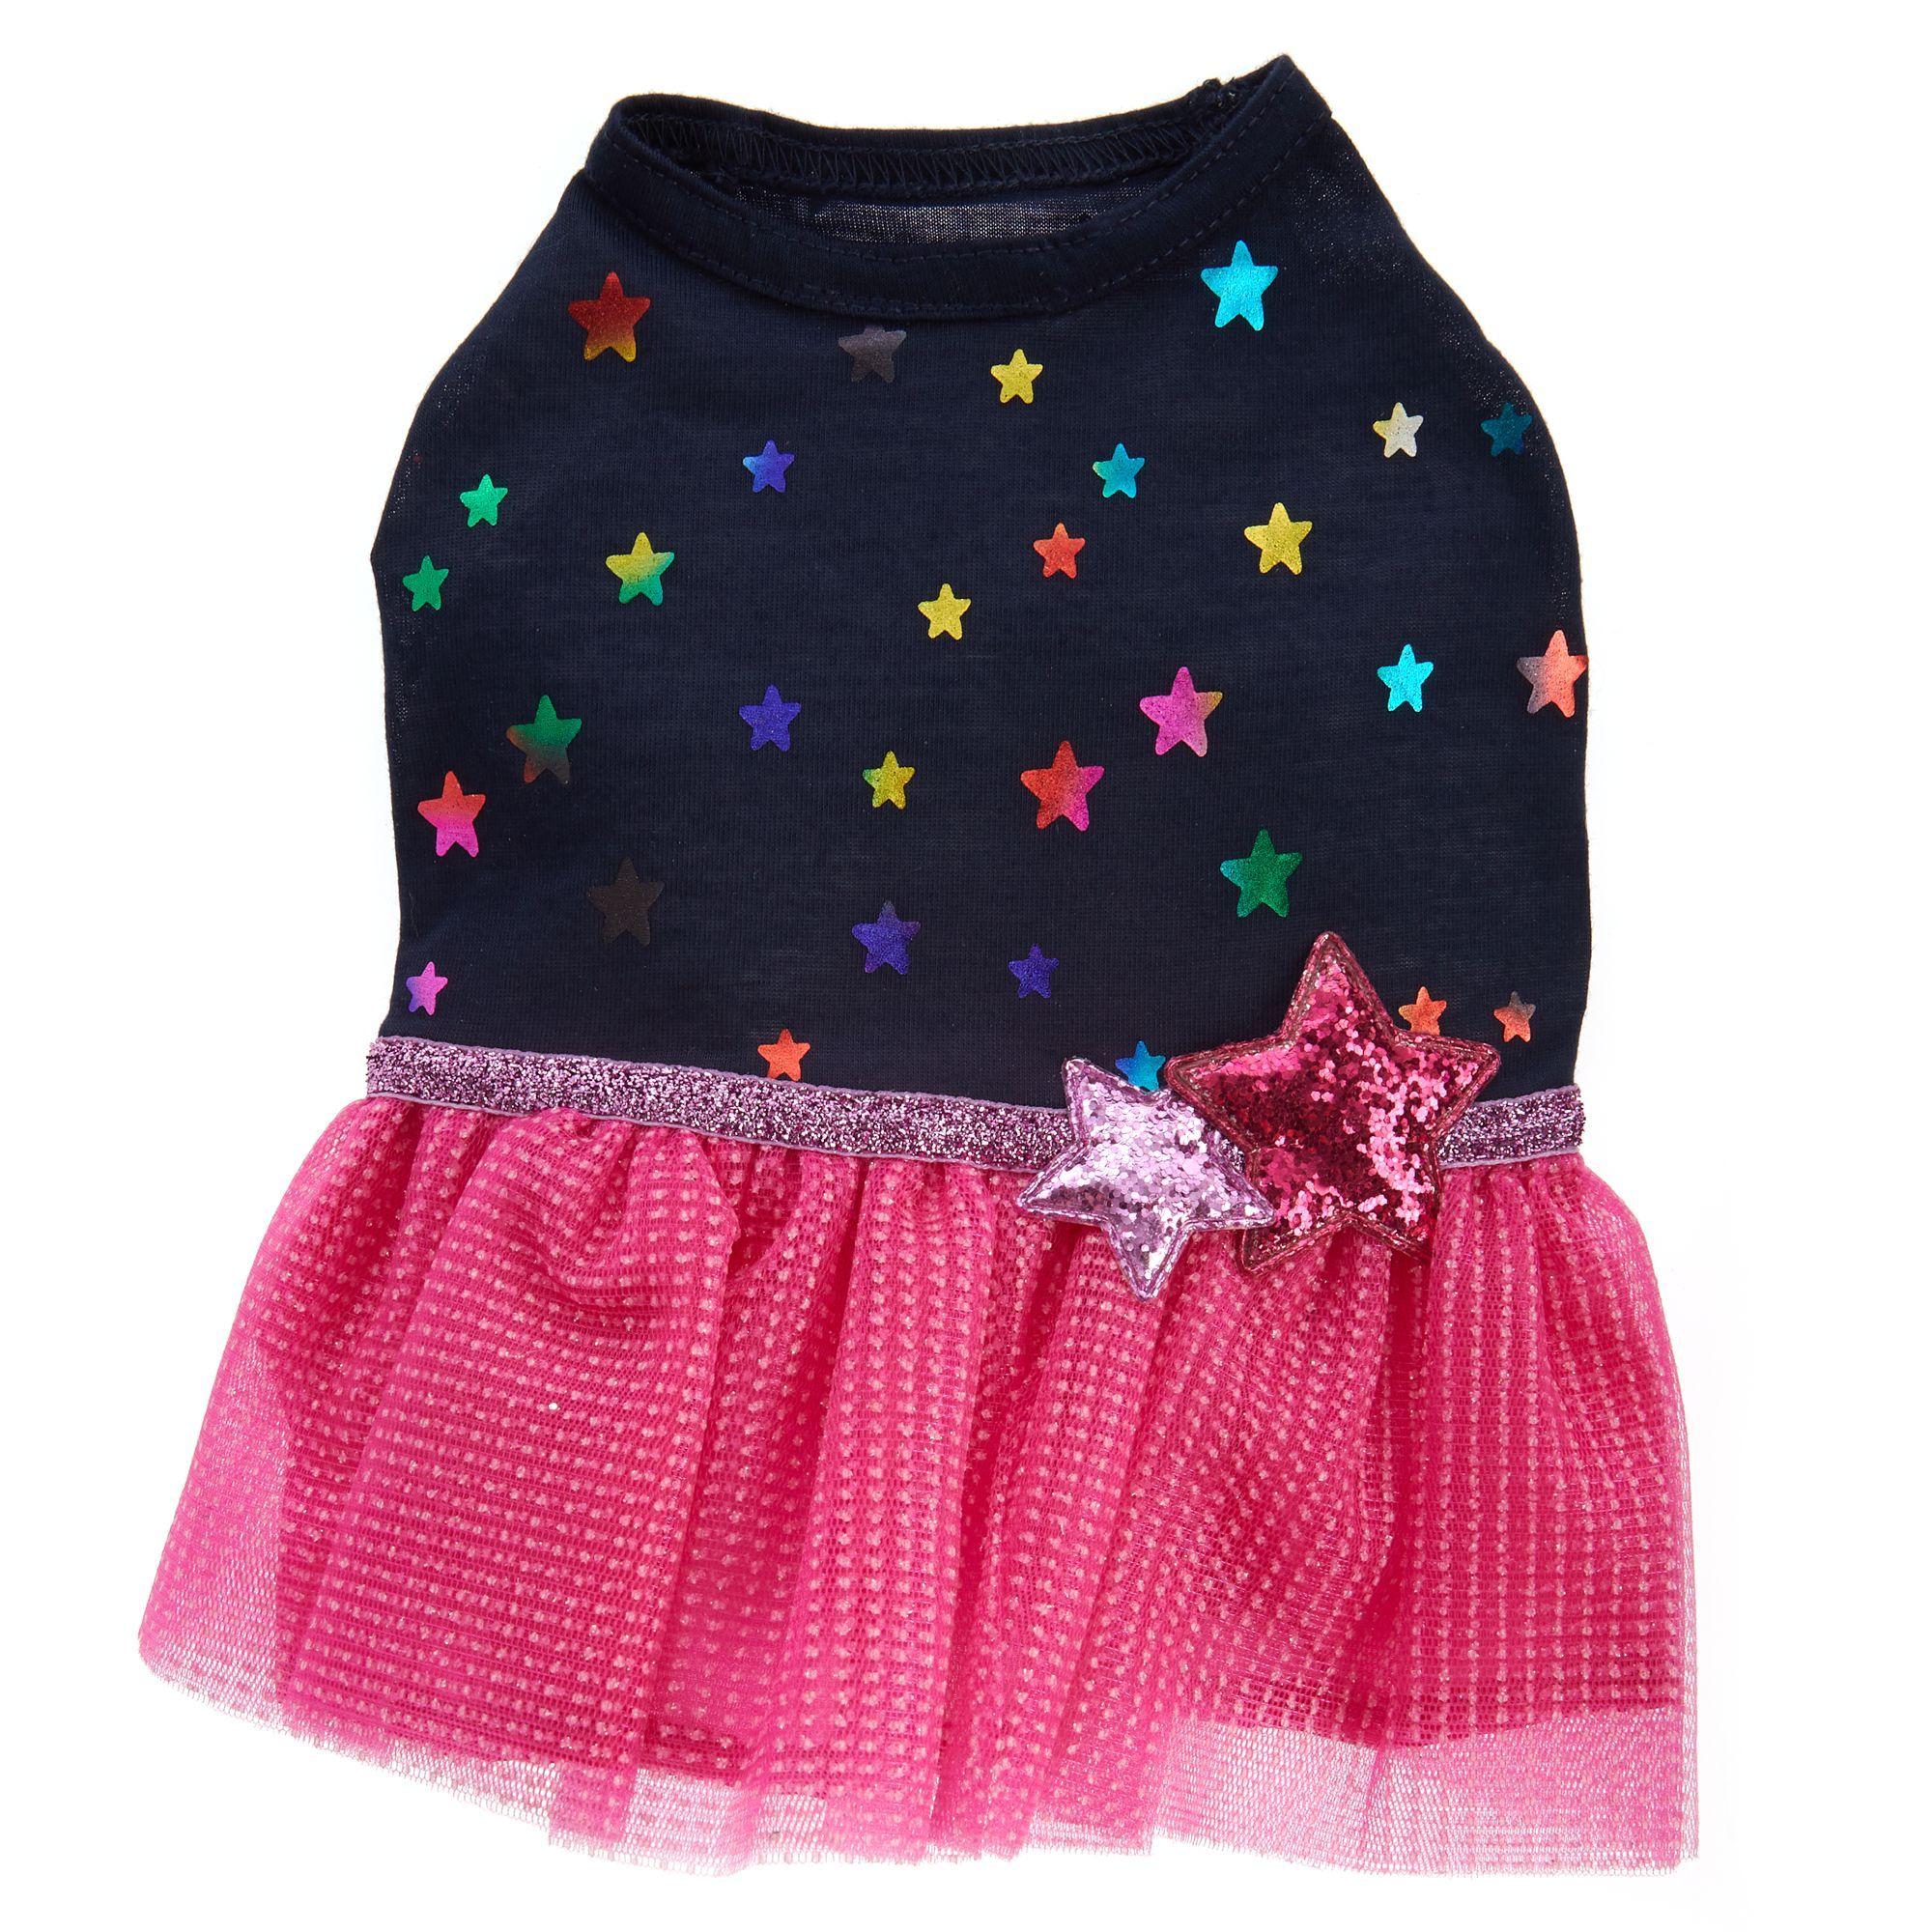 Top Paw Stars And Tulle Pet Dress Size X Small Pet Dress Dog Dresses Mini Skirts